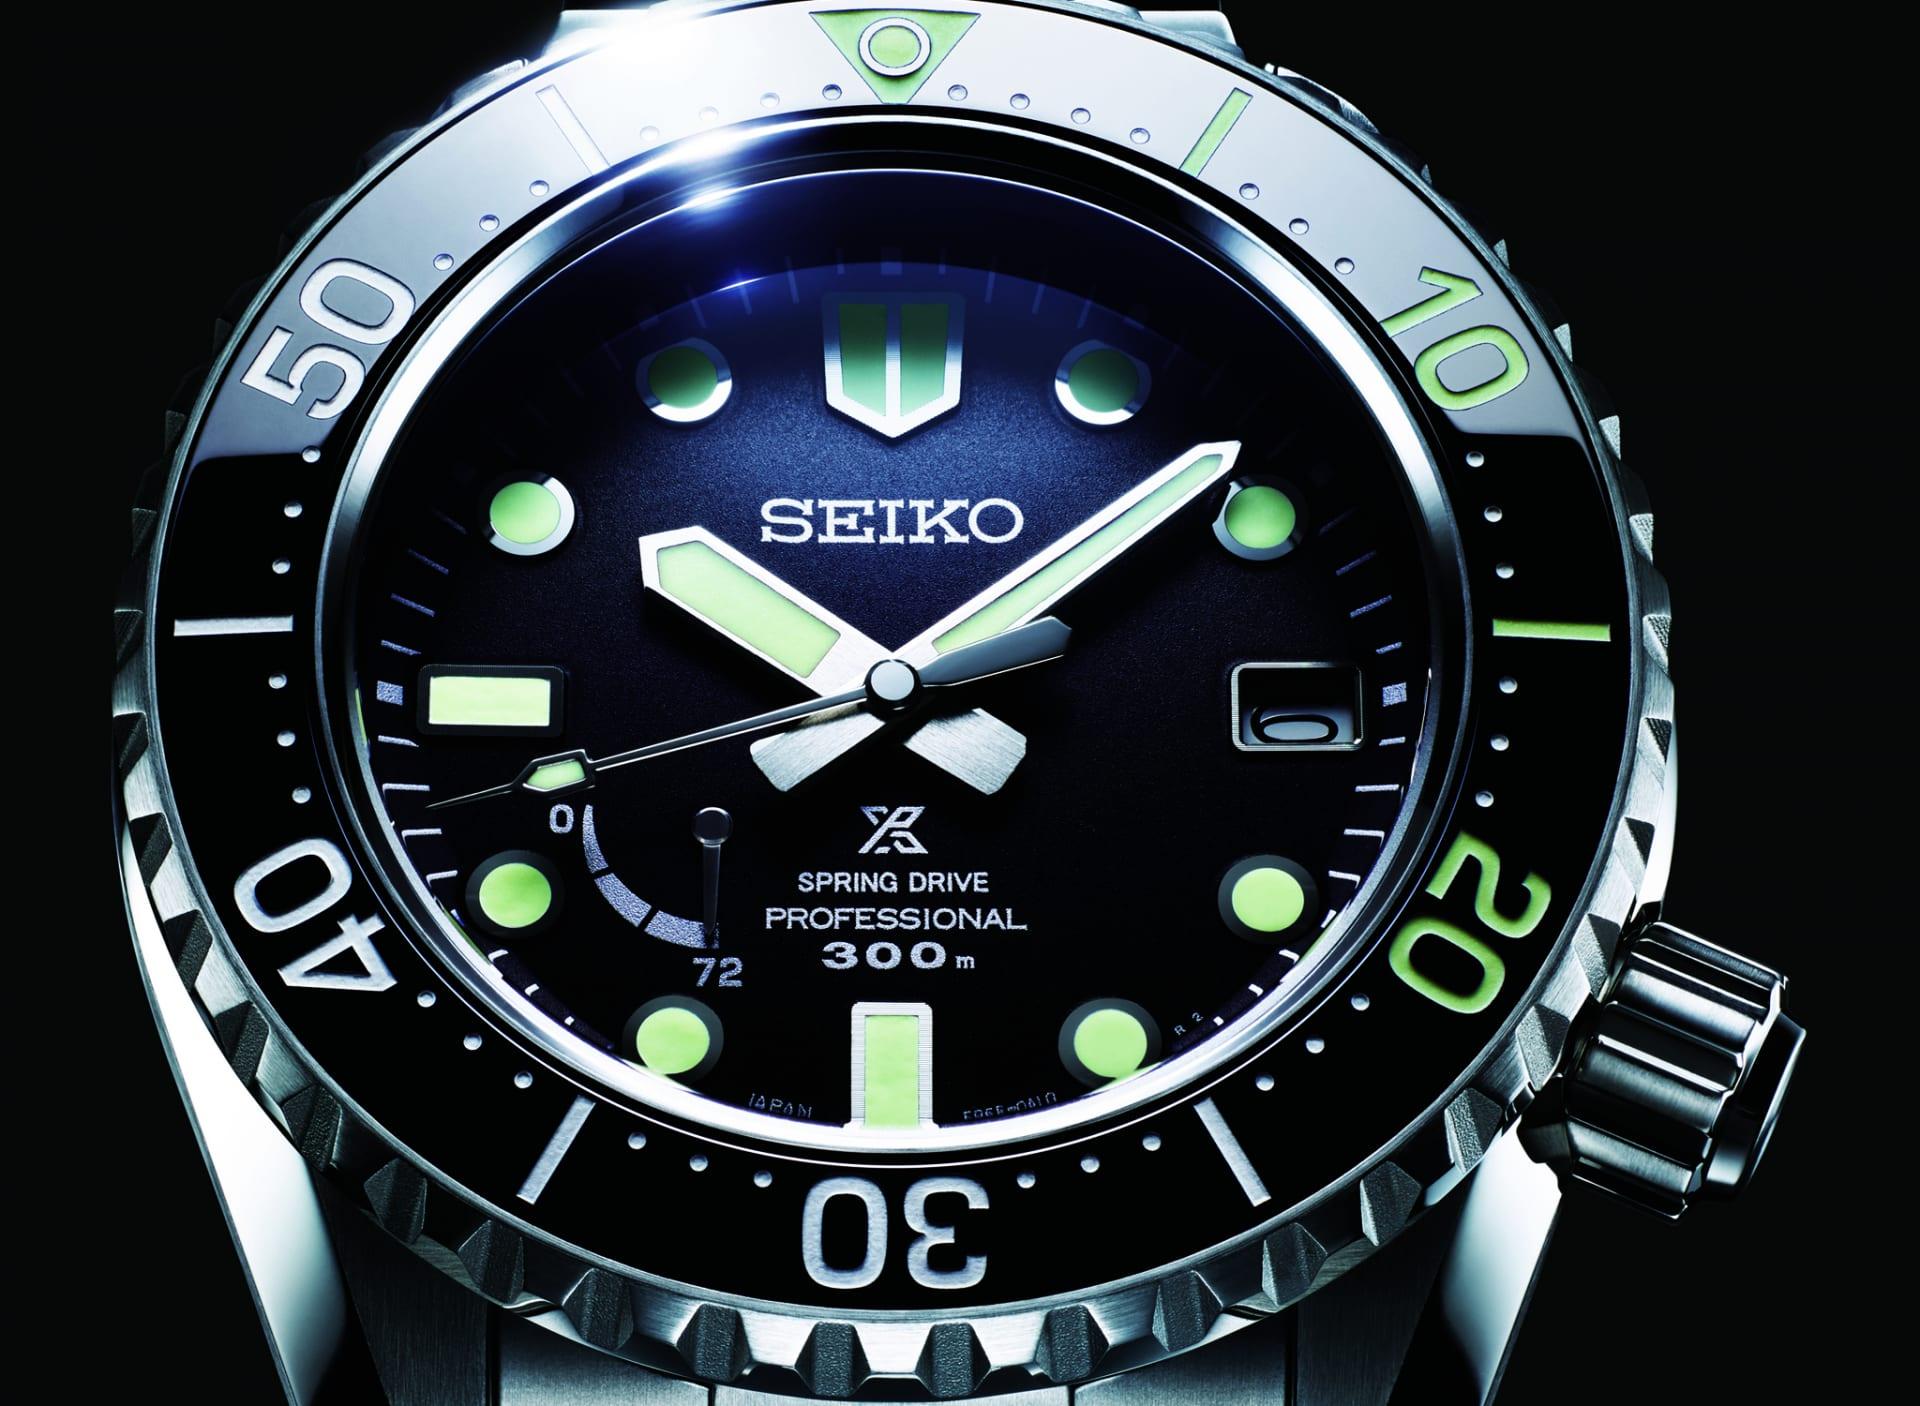 Seiko Dive Watch